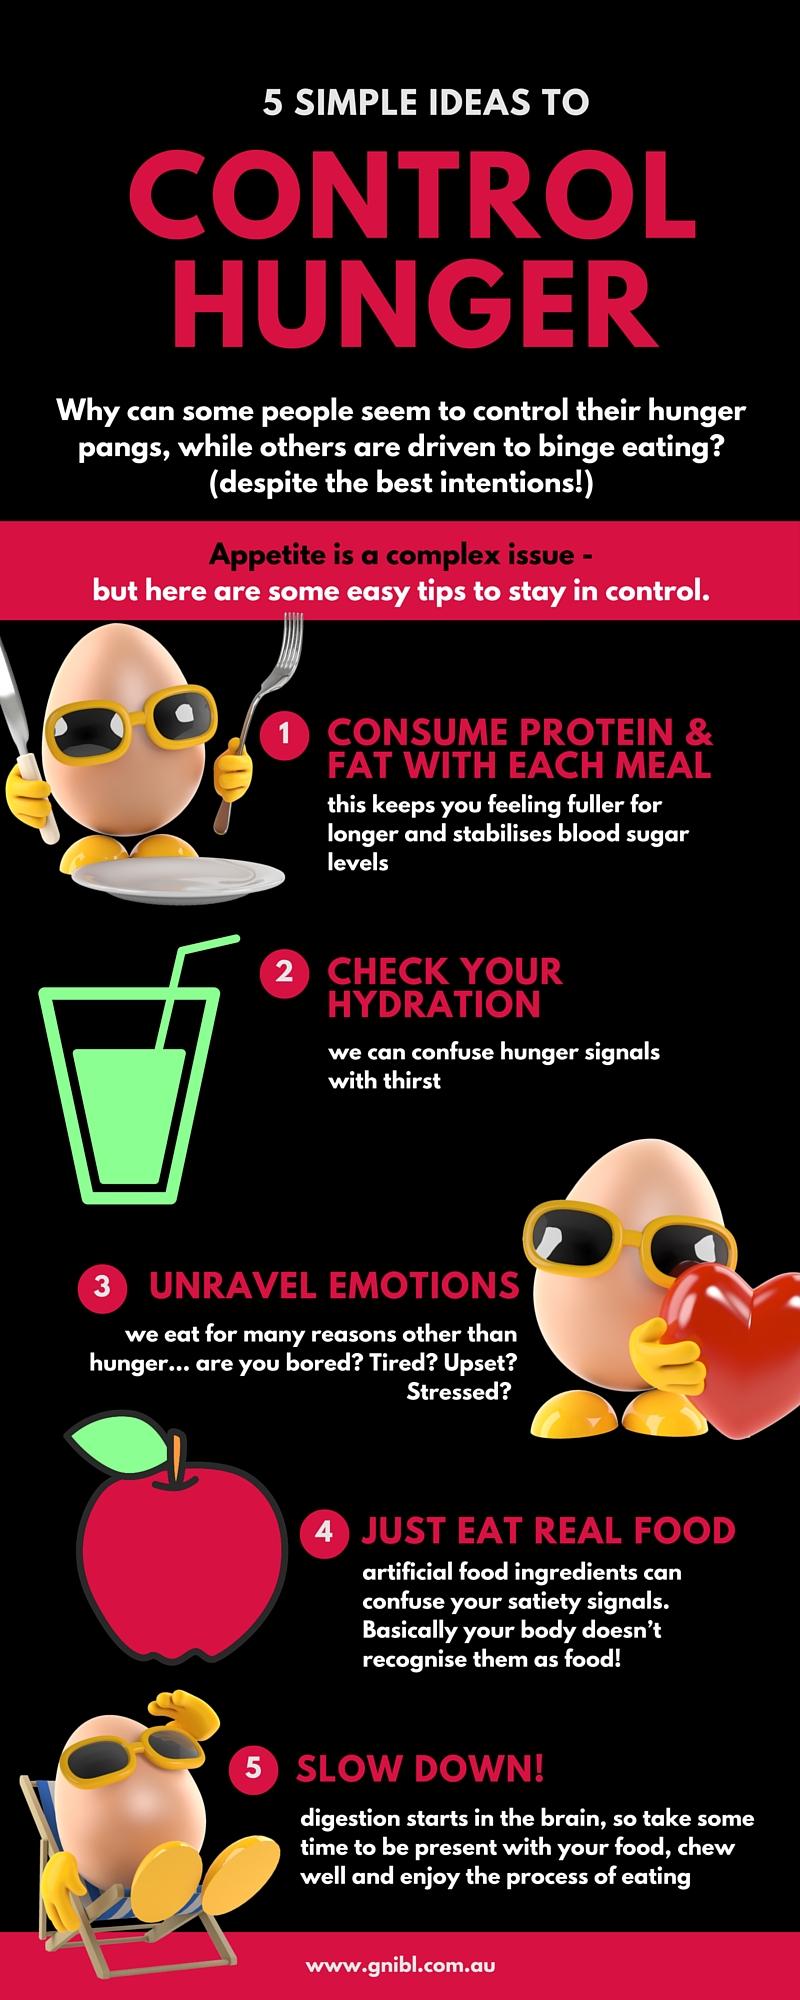 Control Hunger Info.jpg